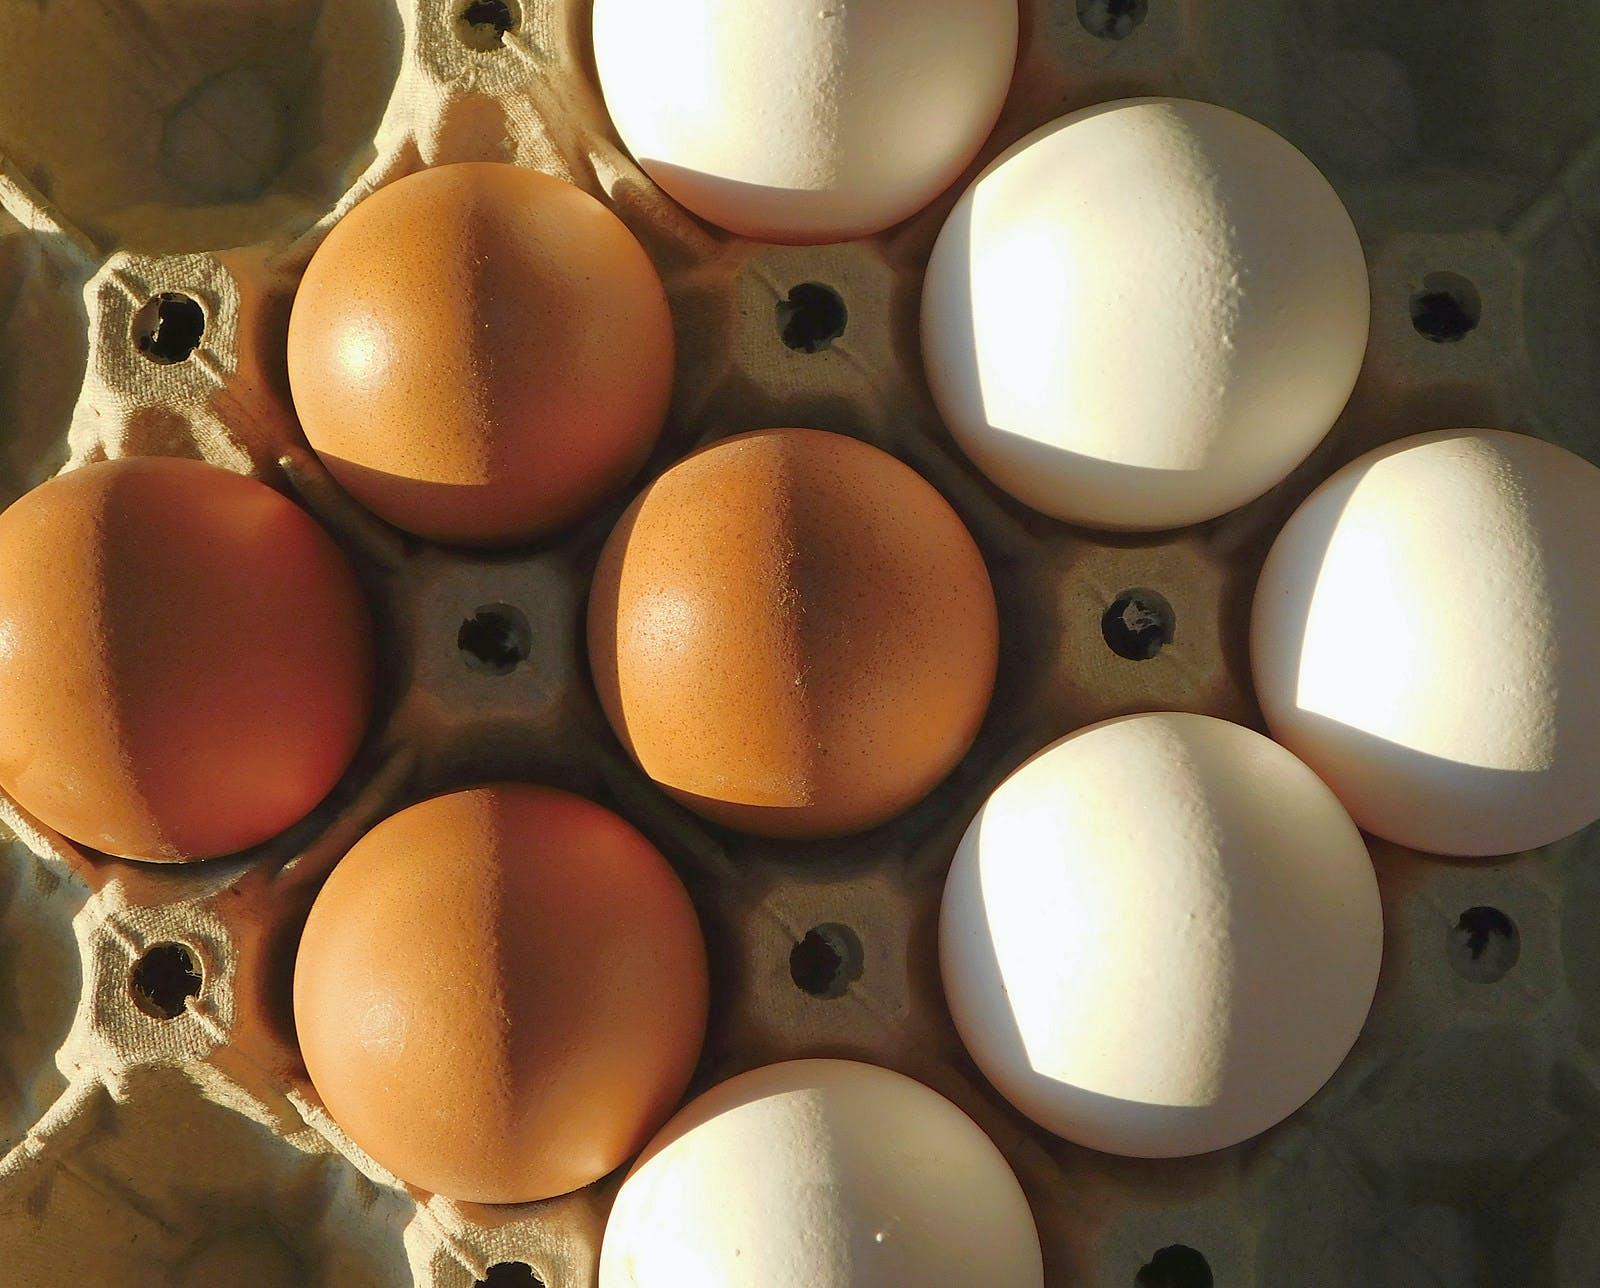 Organic white eggs vs. farm Organic white eggs vs. farm eggs. White Natural Organic Eggs and Chicken Farm Eggs. Natural foods to mass-produced foods.eggs. White Natural Organic Eggs and Chicken Farm Eggs. Natural foods to mass-produced foods.